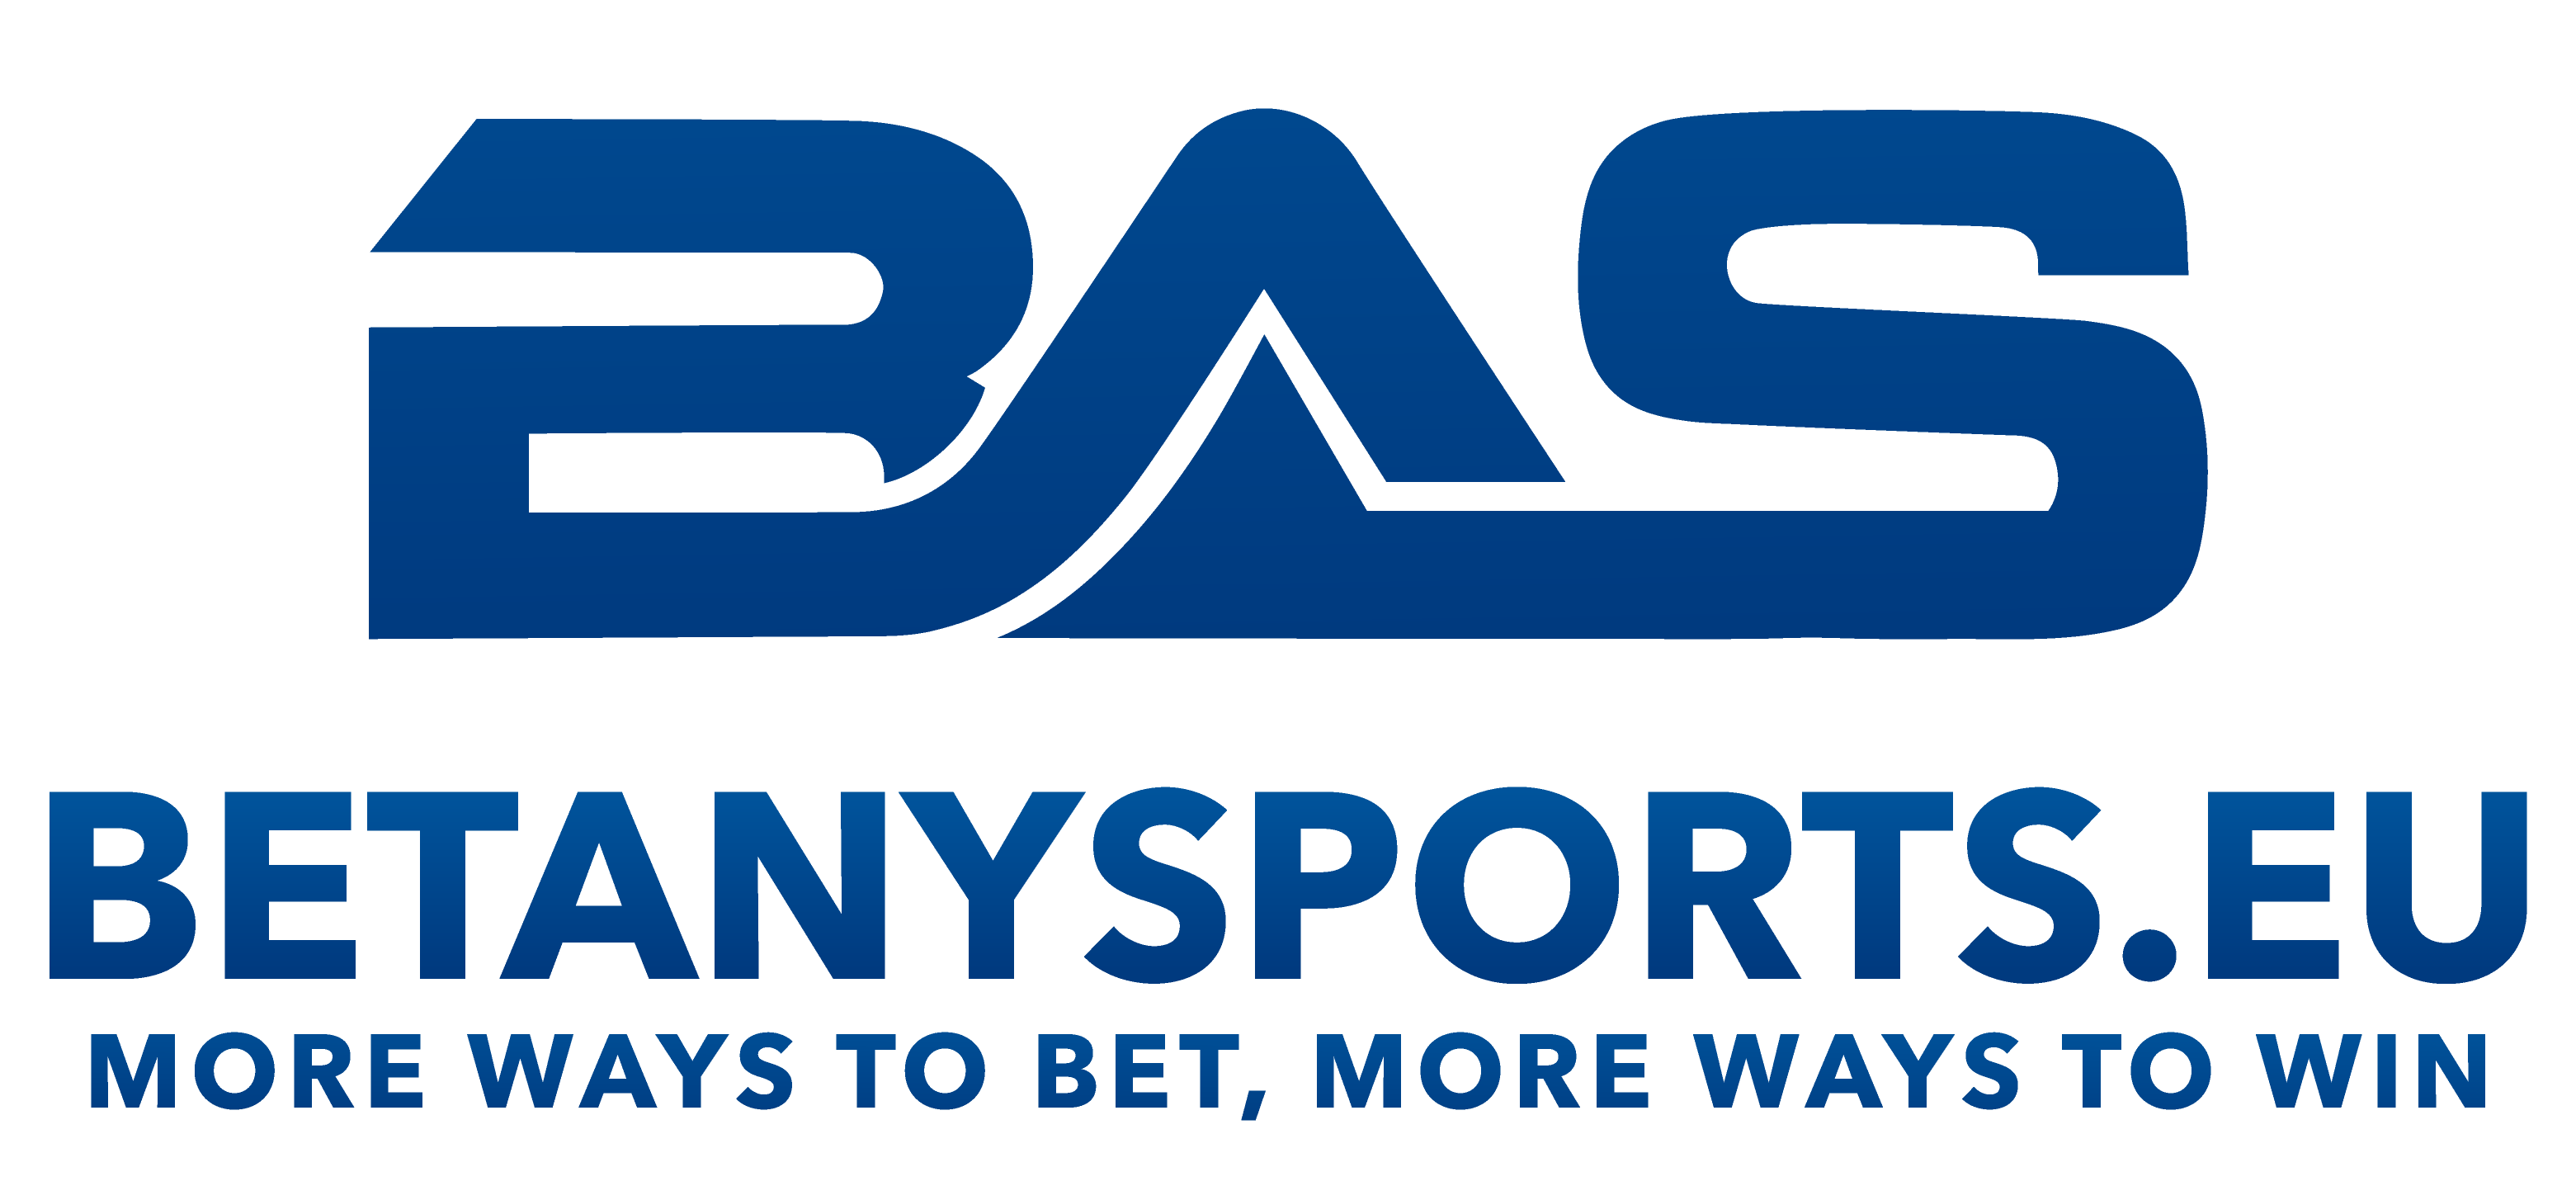 BetAnySports Review Logo